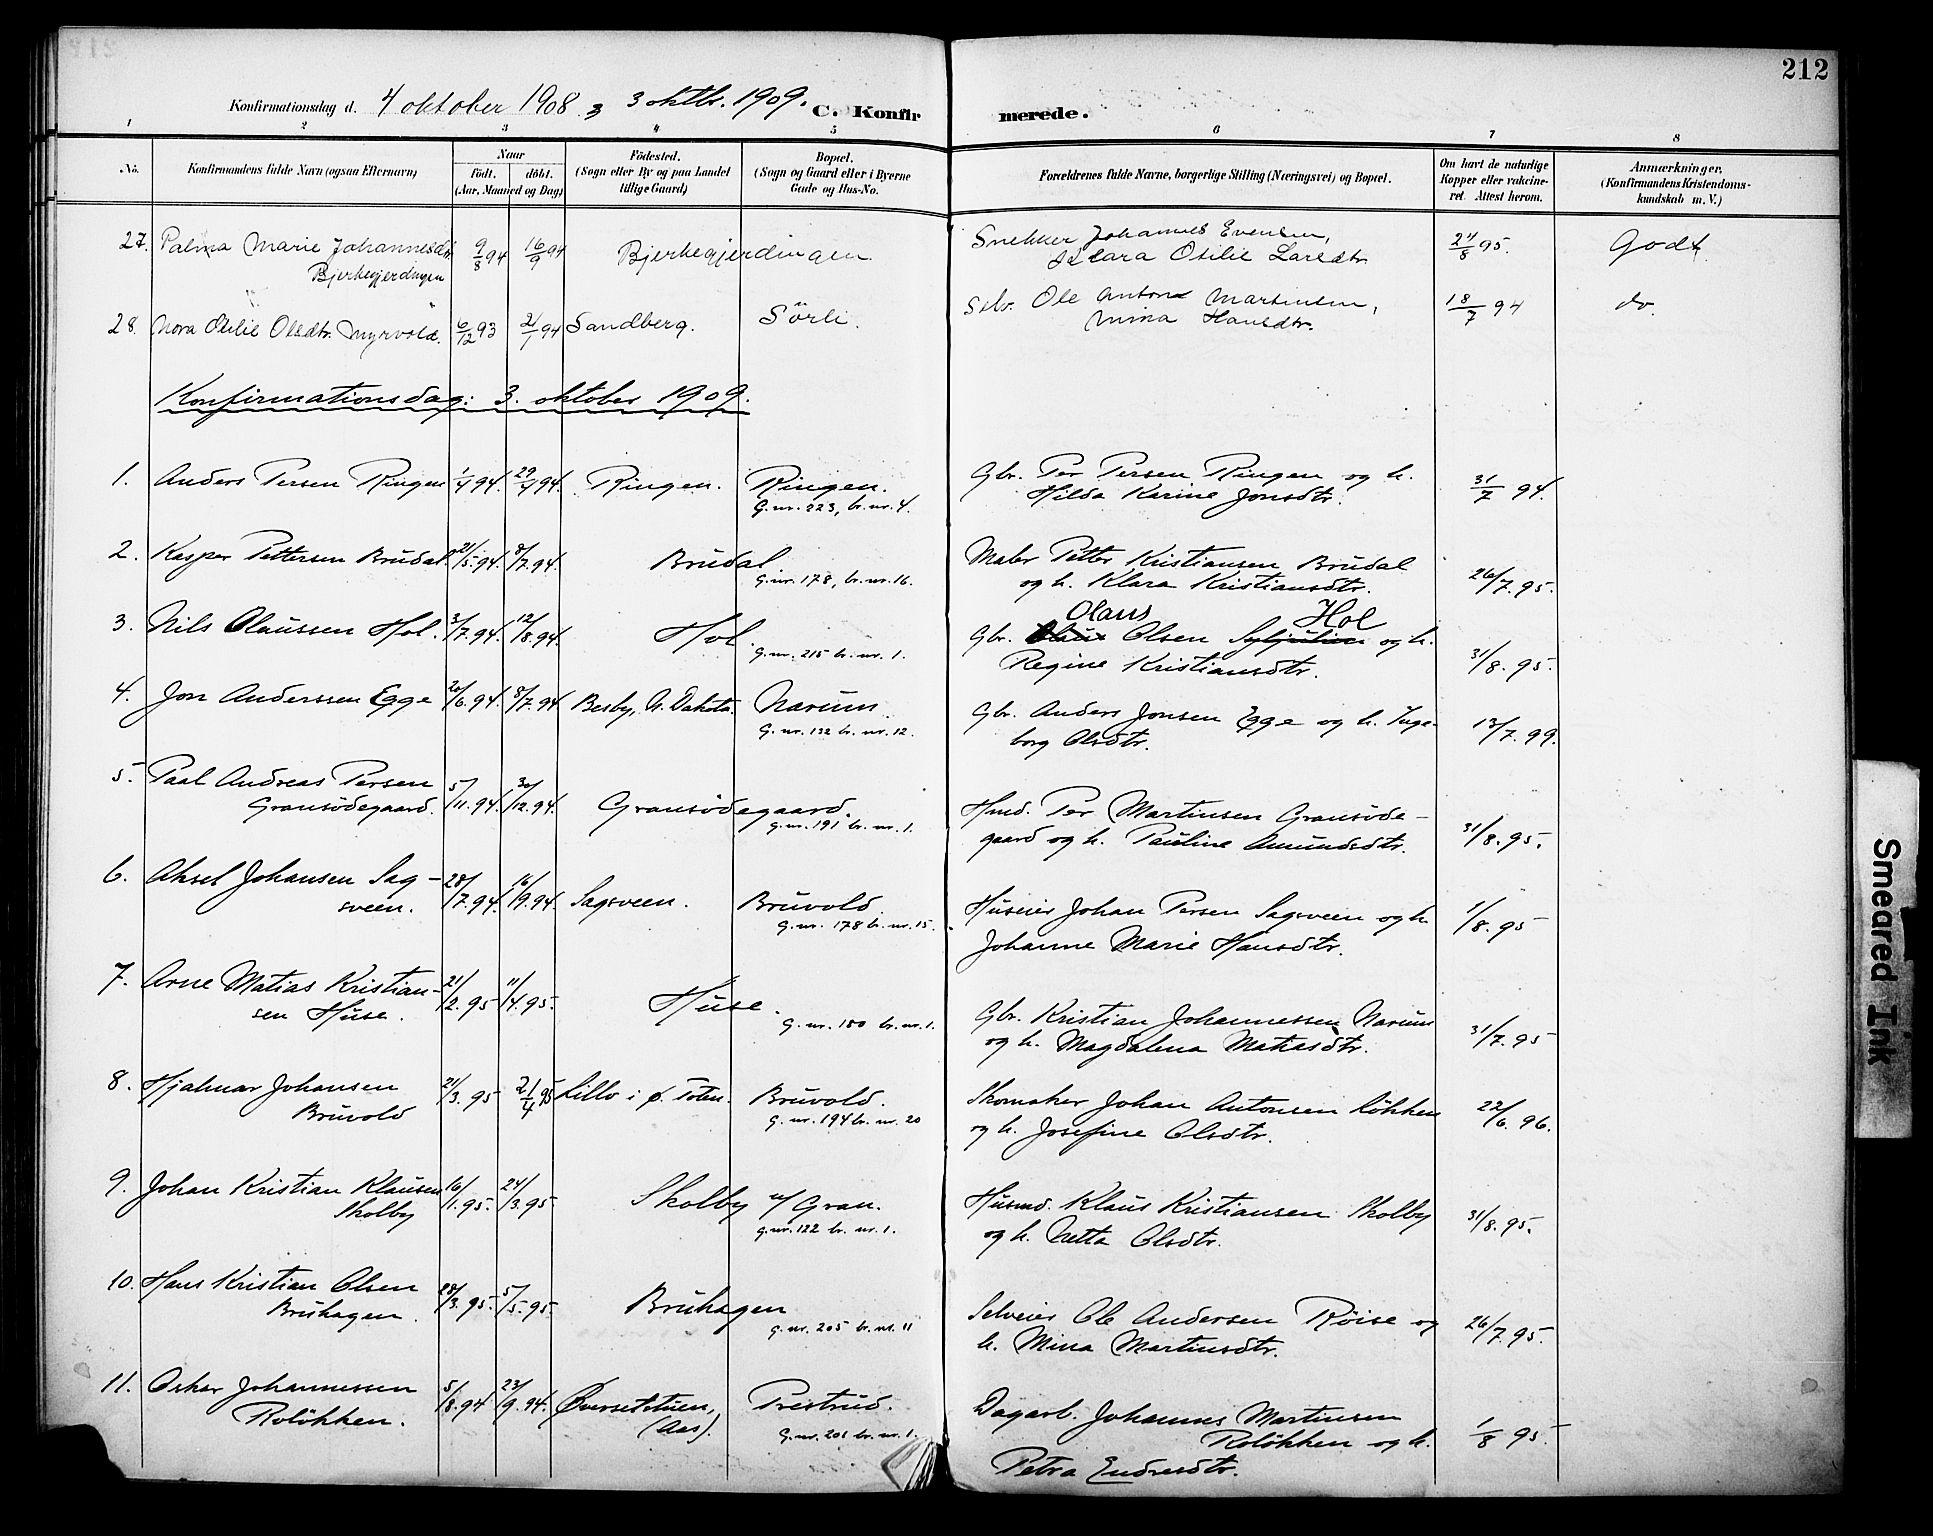 SAH, Vestre Toten prestekontor, H/Ha/Haa/L0013: Ministerialbok nr. 13, 1895-1911, s. 212